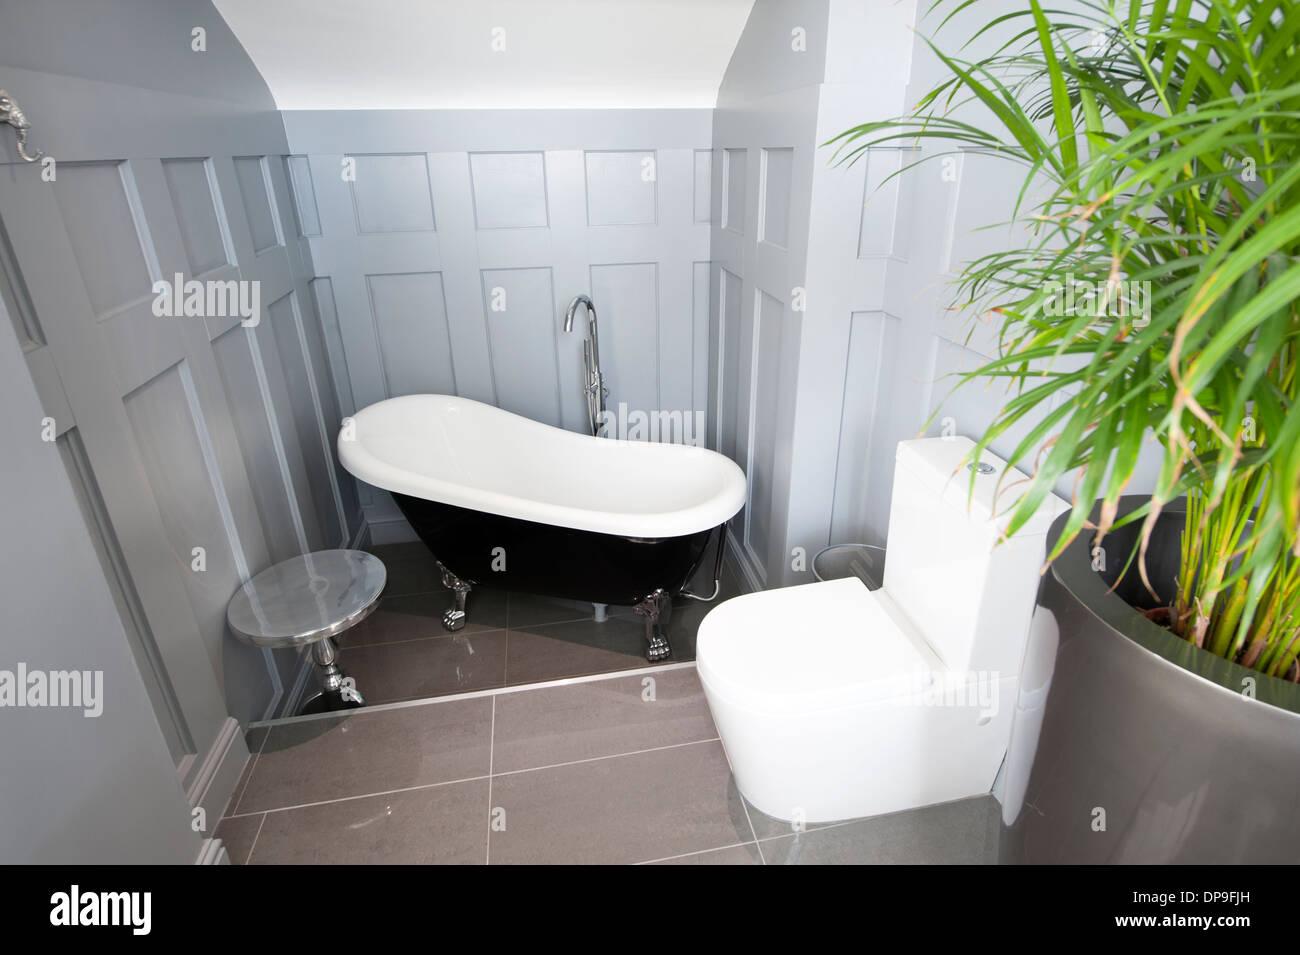 Victorian Bath Tub Stock Photos & Victorian Bath Tub Stock Images ...